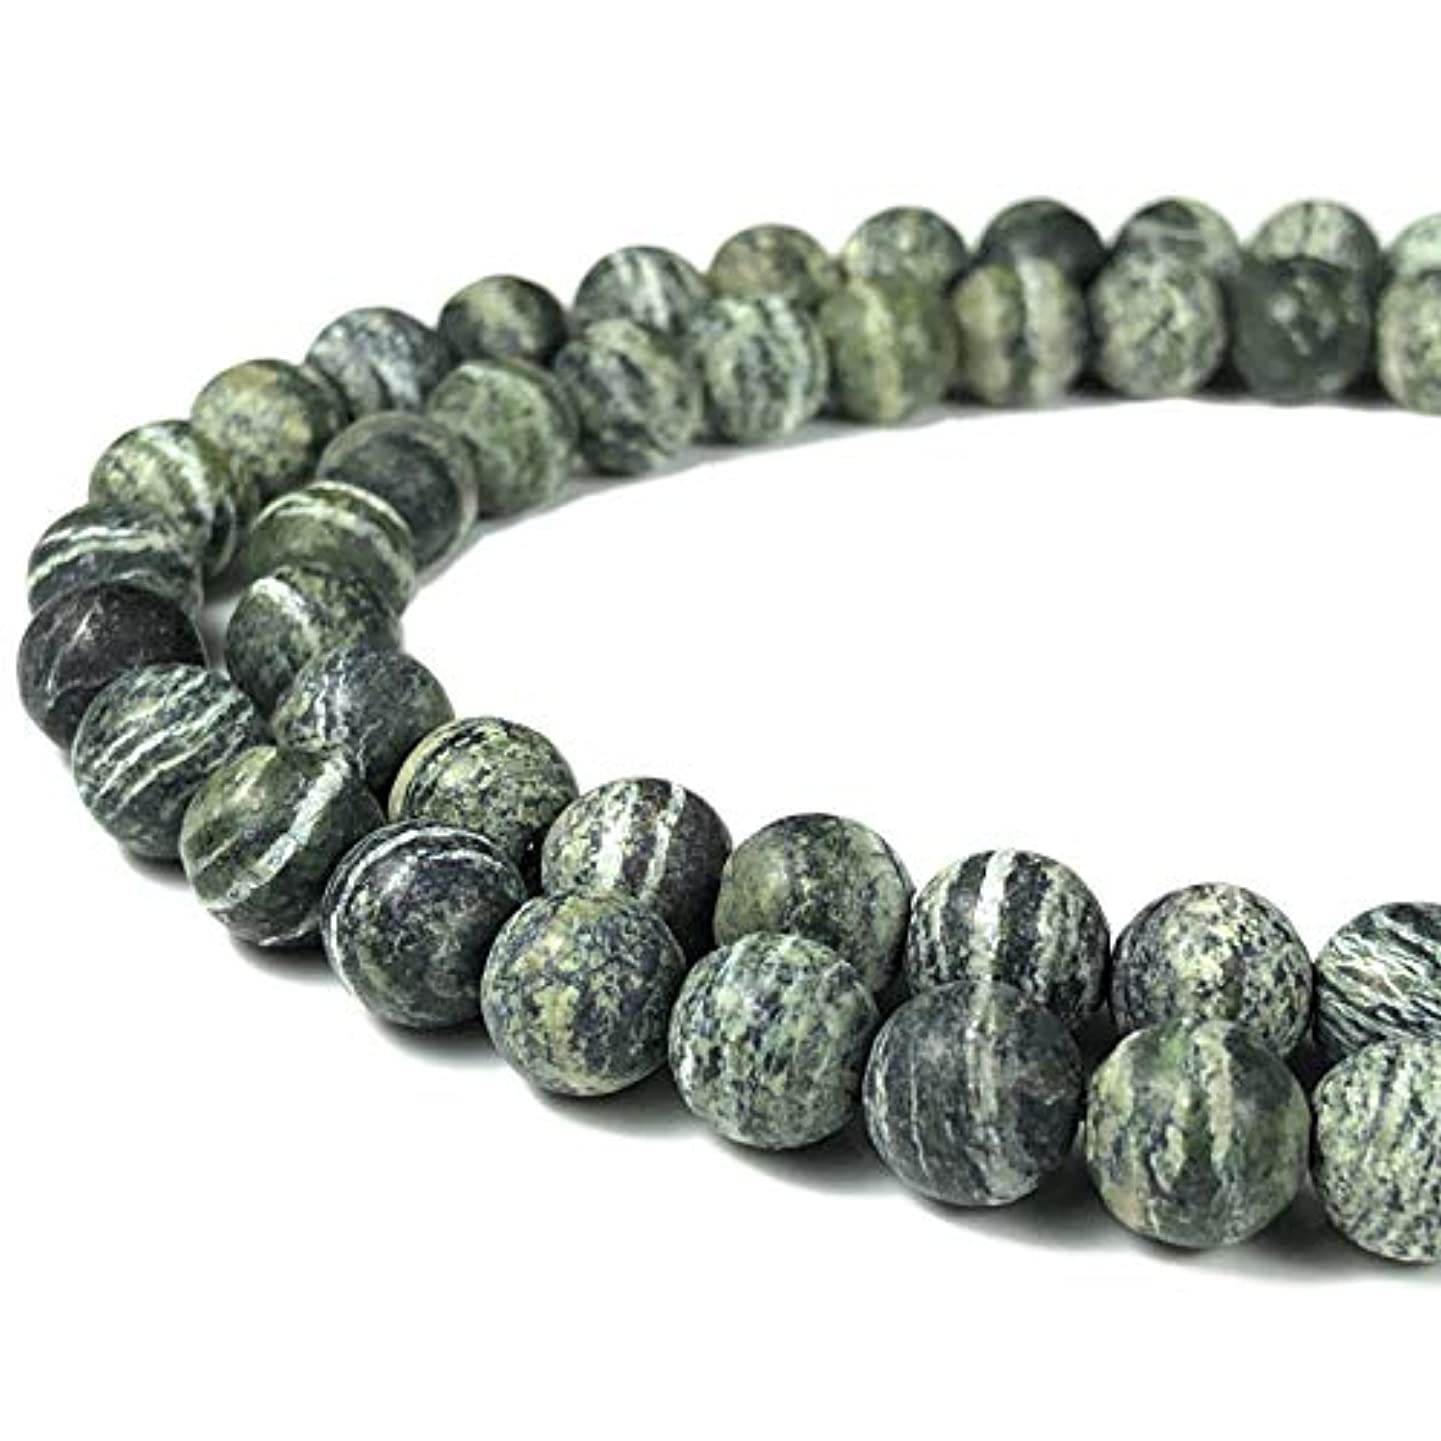 [ABCgems] Matte Brazilian Silver Leaf Serpentine (Beautiful Zebra Matrix) 8mm Smooth Round Beads for Beading & Jewelry Making